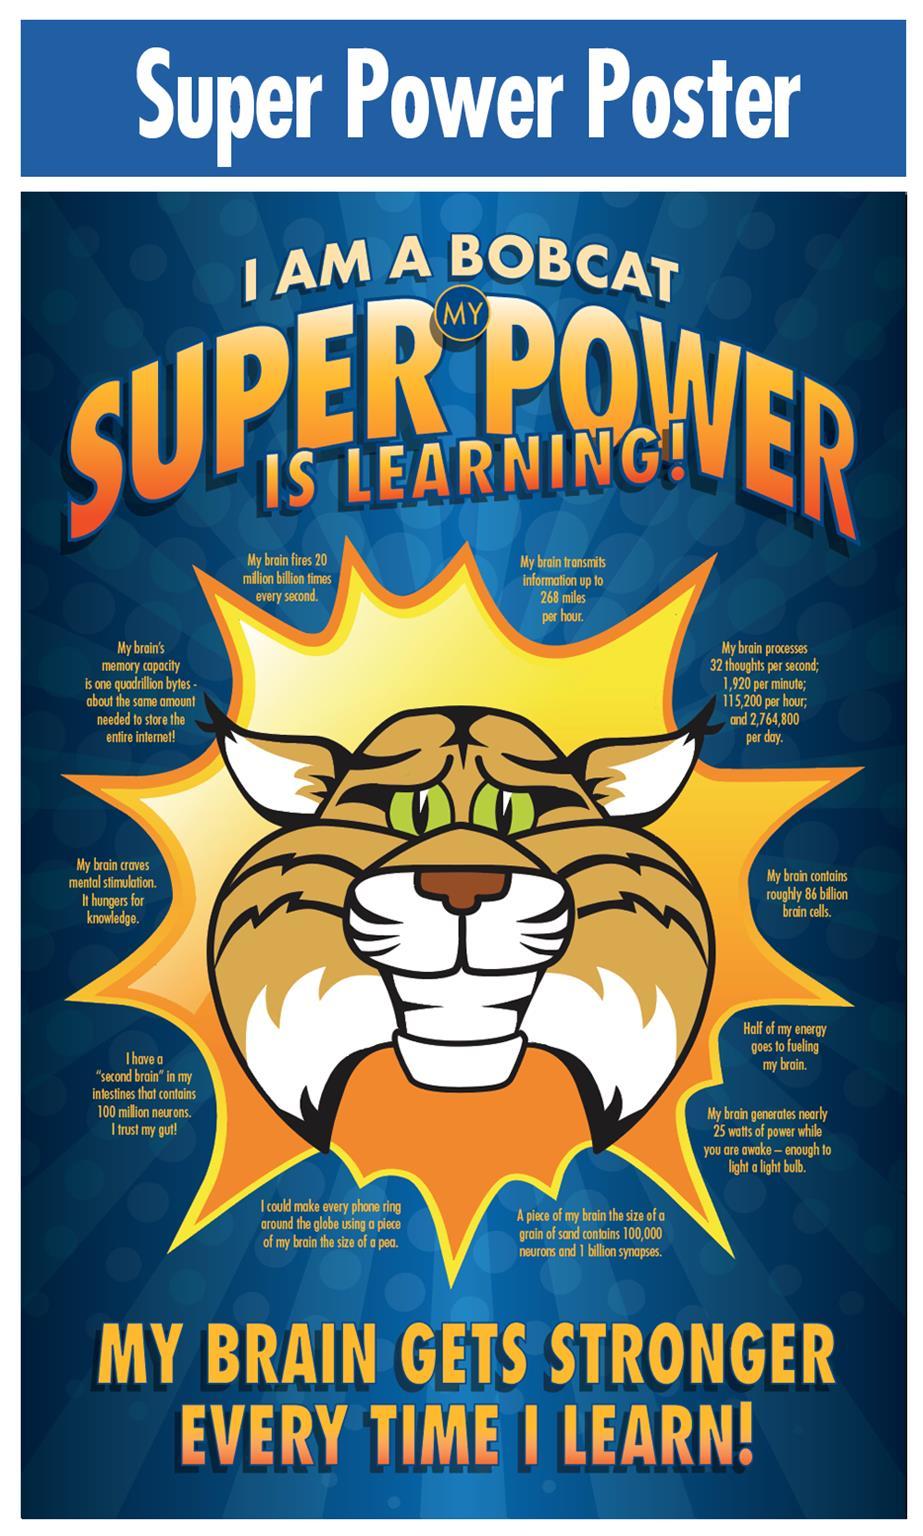 Super Power Poster Bobcat1